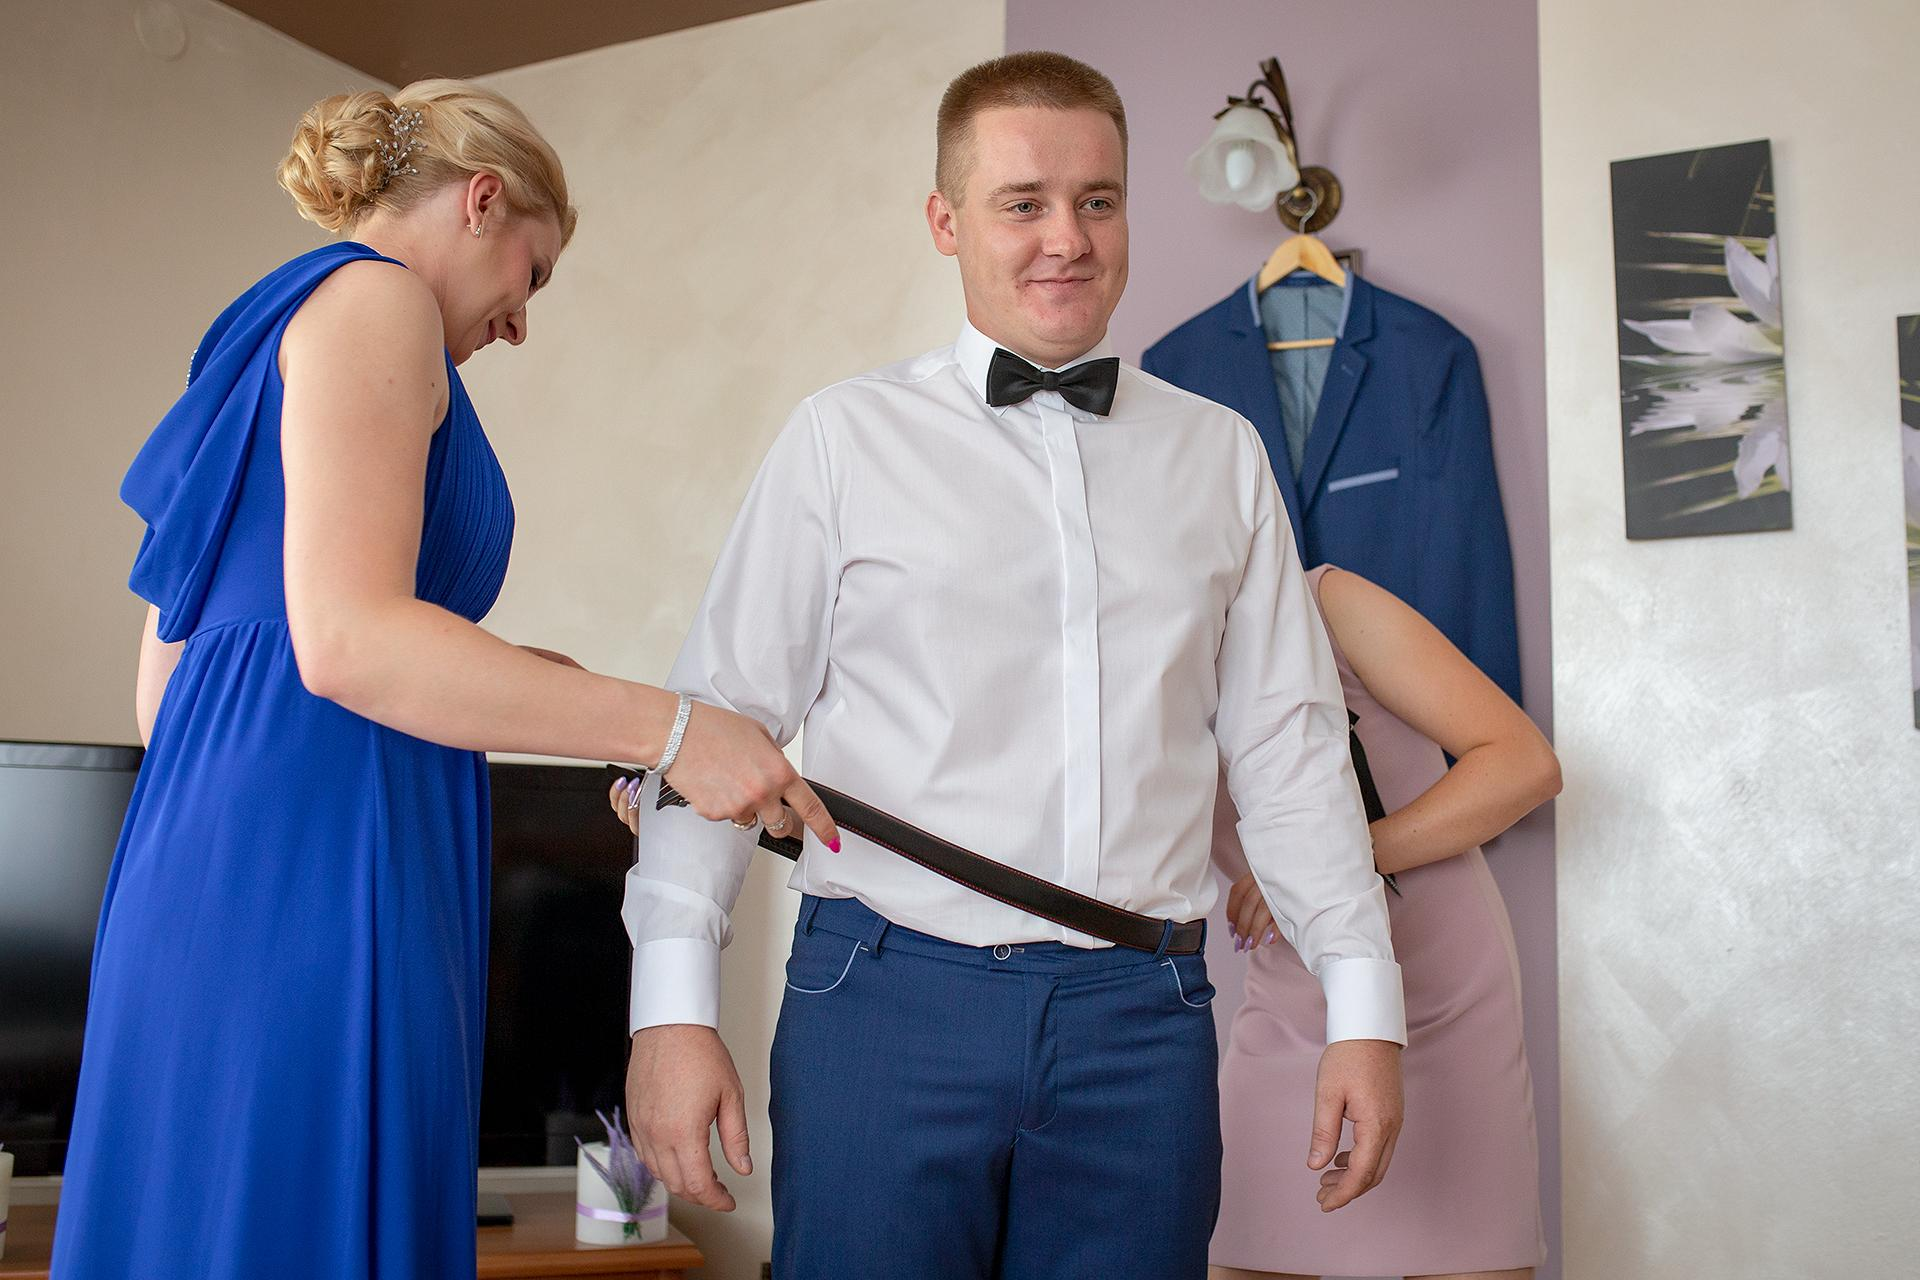 Pasek pana młodego - reportaż ślubny